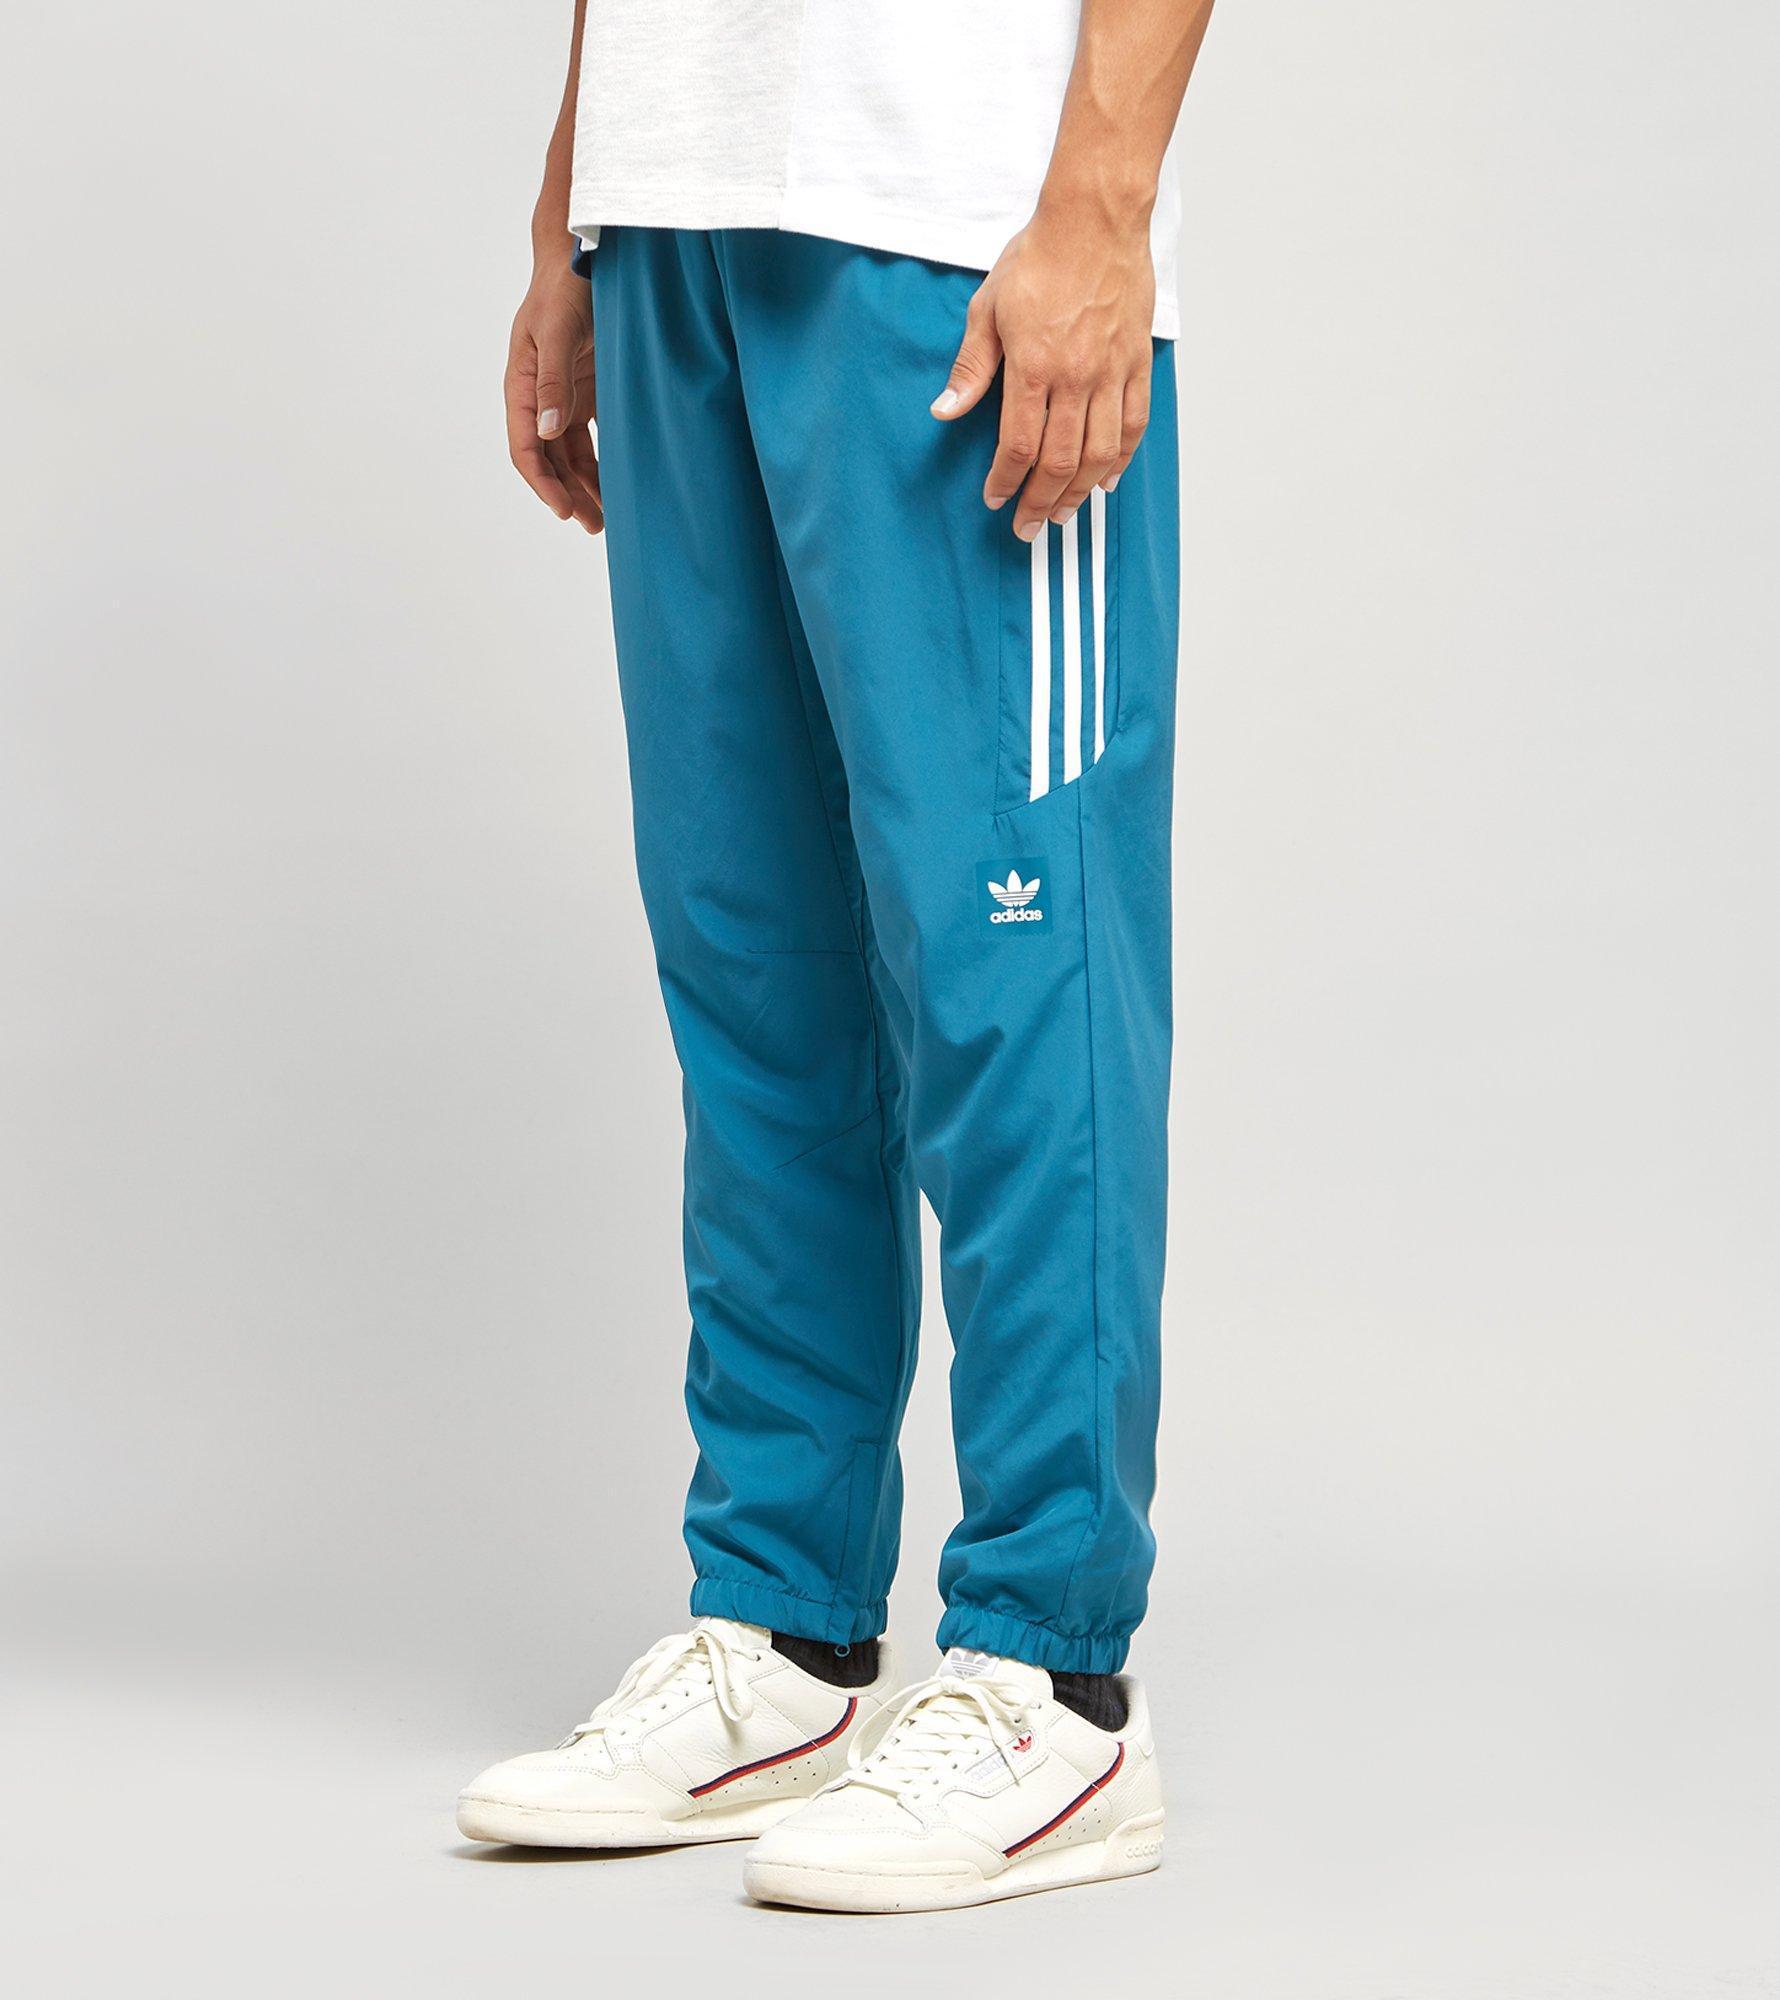 adidas Pantalon Classic Wind WhiteReal Teal